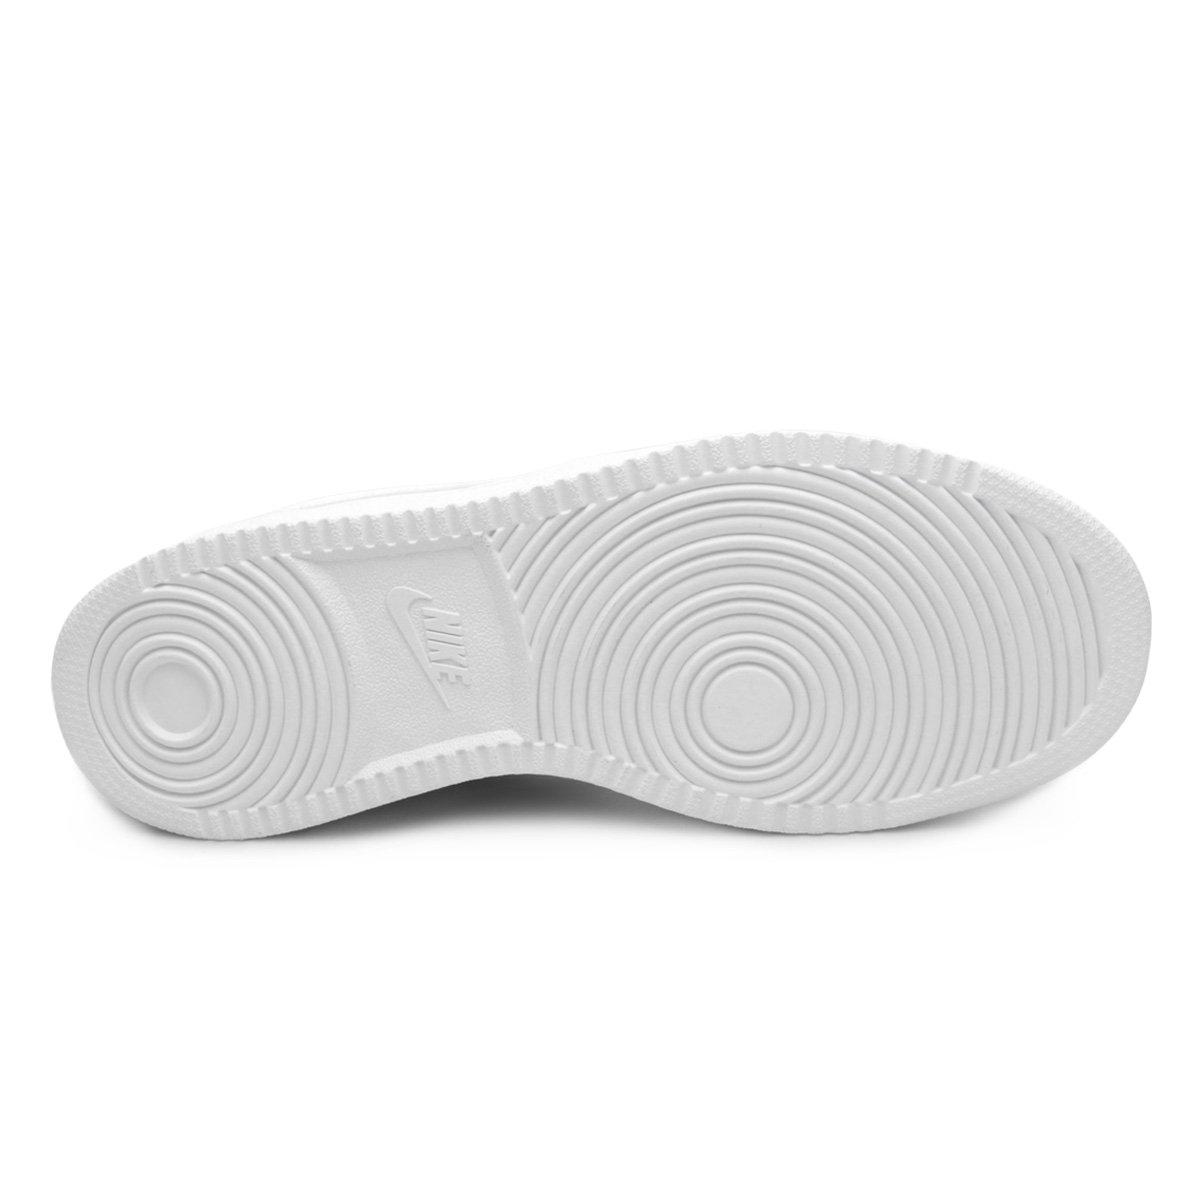 c1ed3c44d1e ... Tênis Nike Ebernon Low Masculino - Branco. COLLECTION  LANÇAMENTO